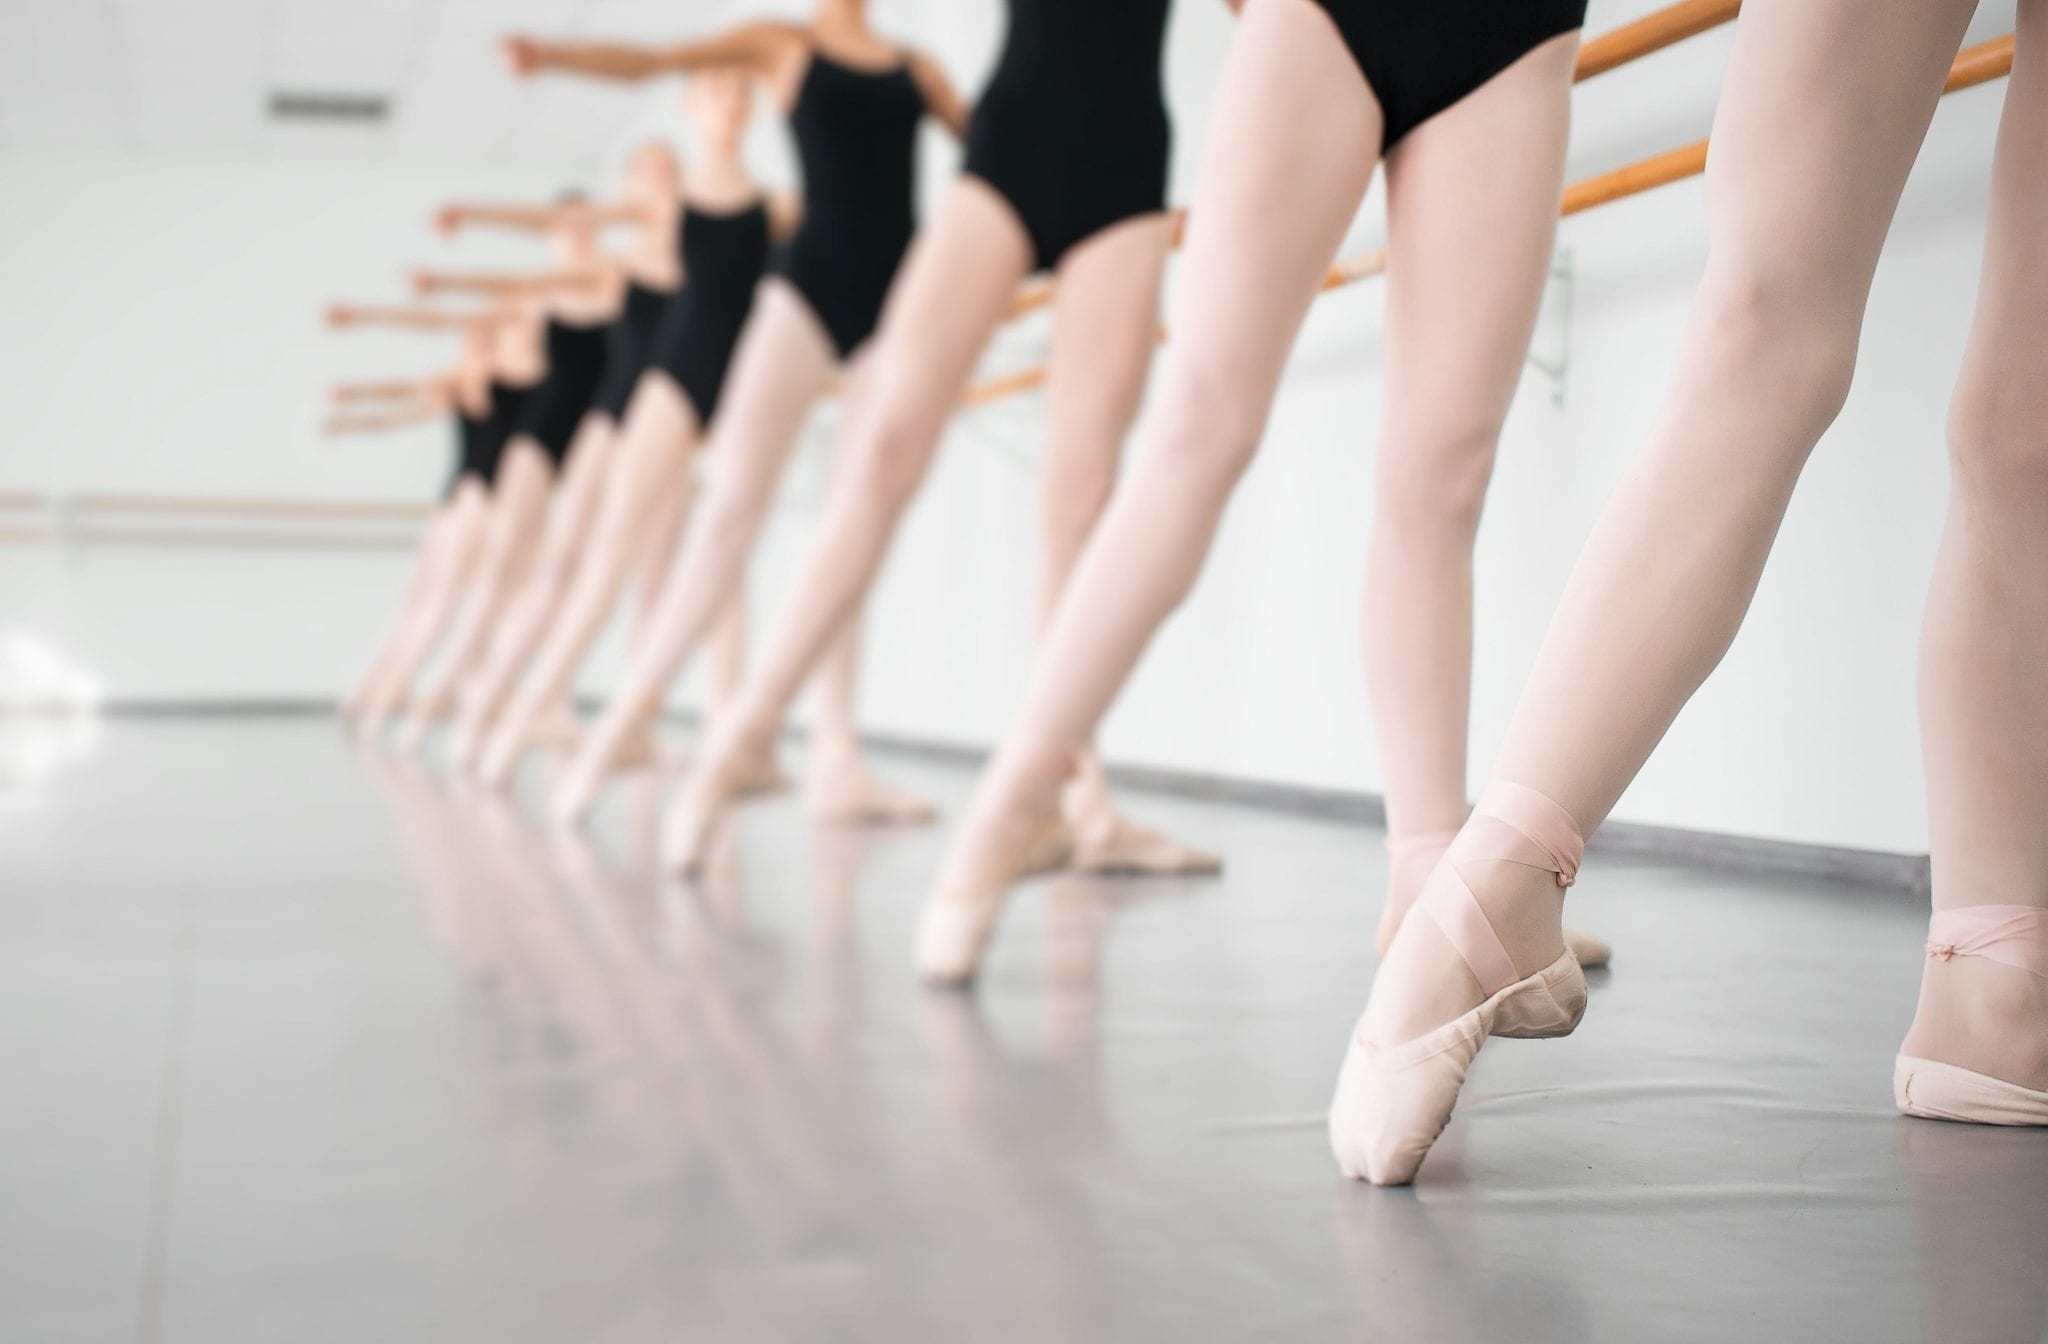 Balletles kledingvoorschriften